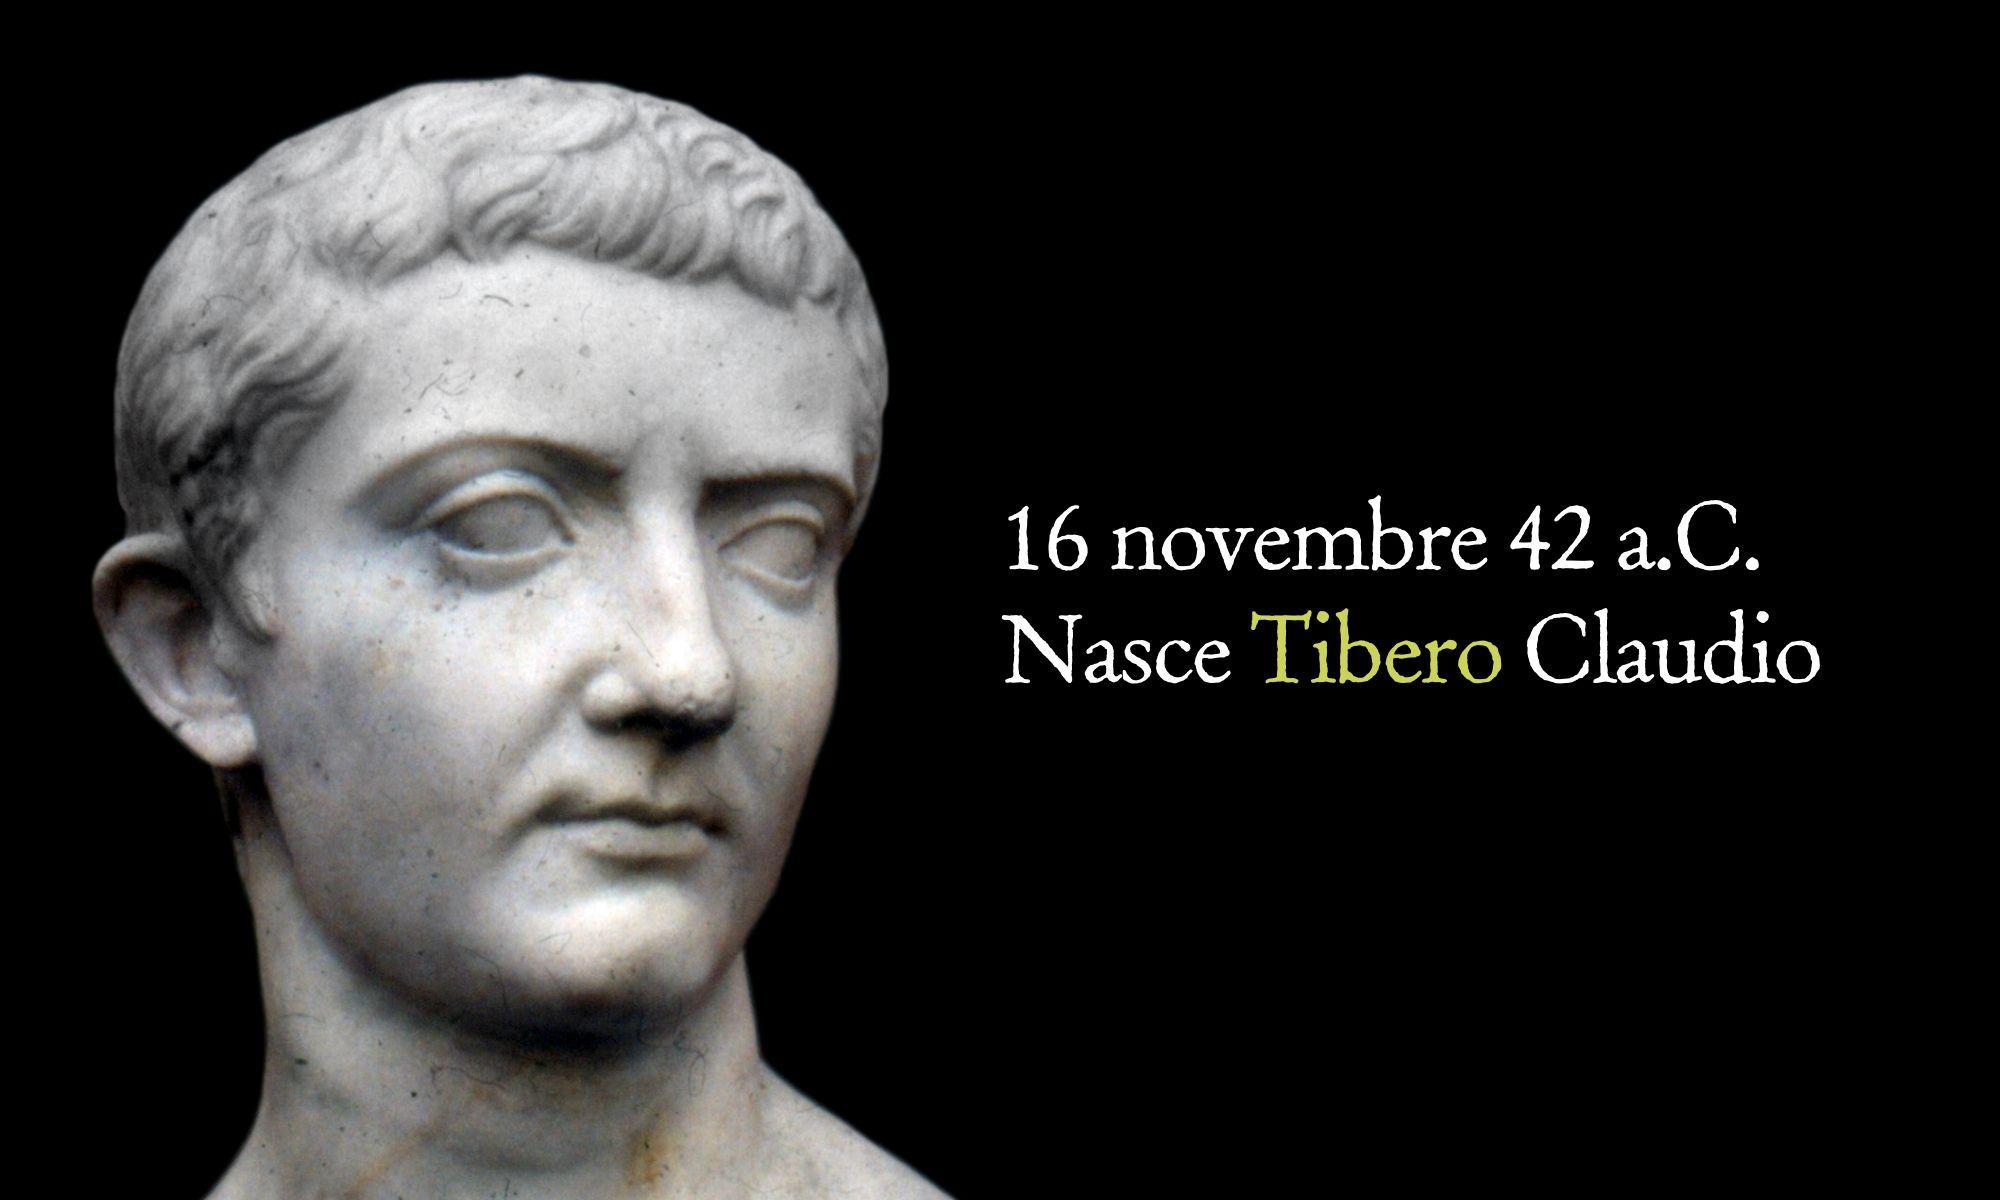 16 novembre 42 a.C. – Nasce Tiberio